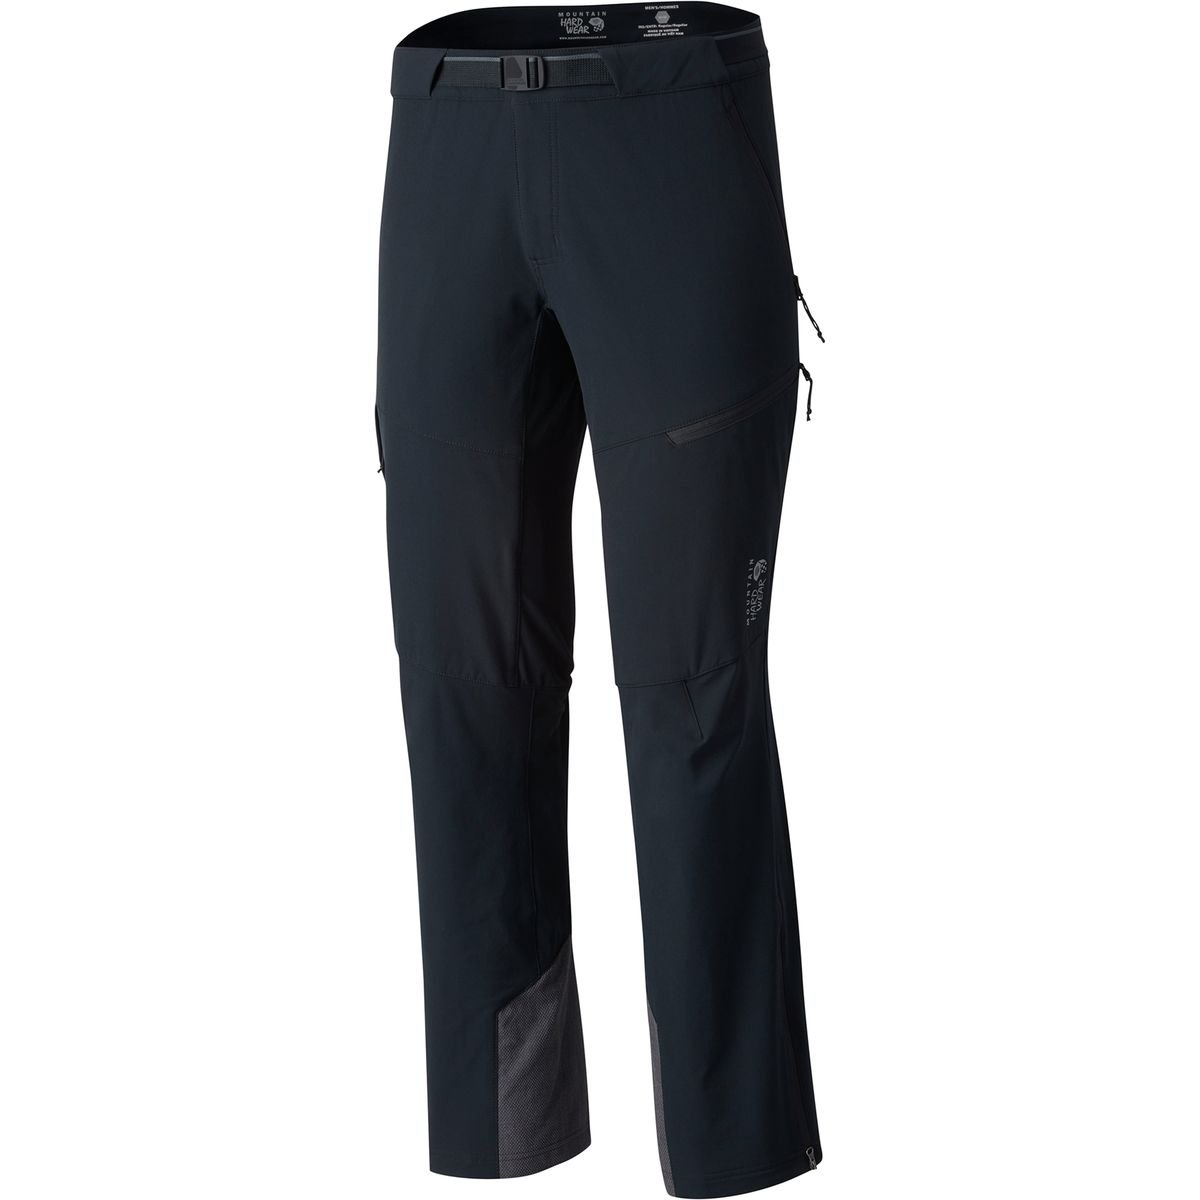 Mountain Hardwear Super Chockstone Hiking Pant - SS17 - Medium - Navy Blue